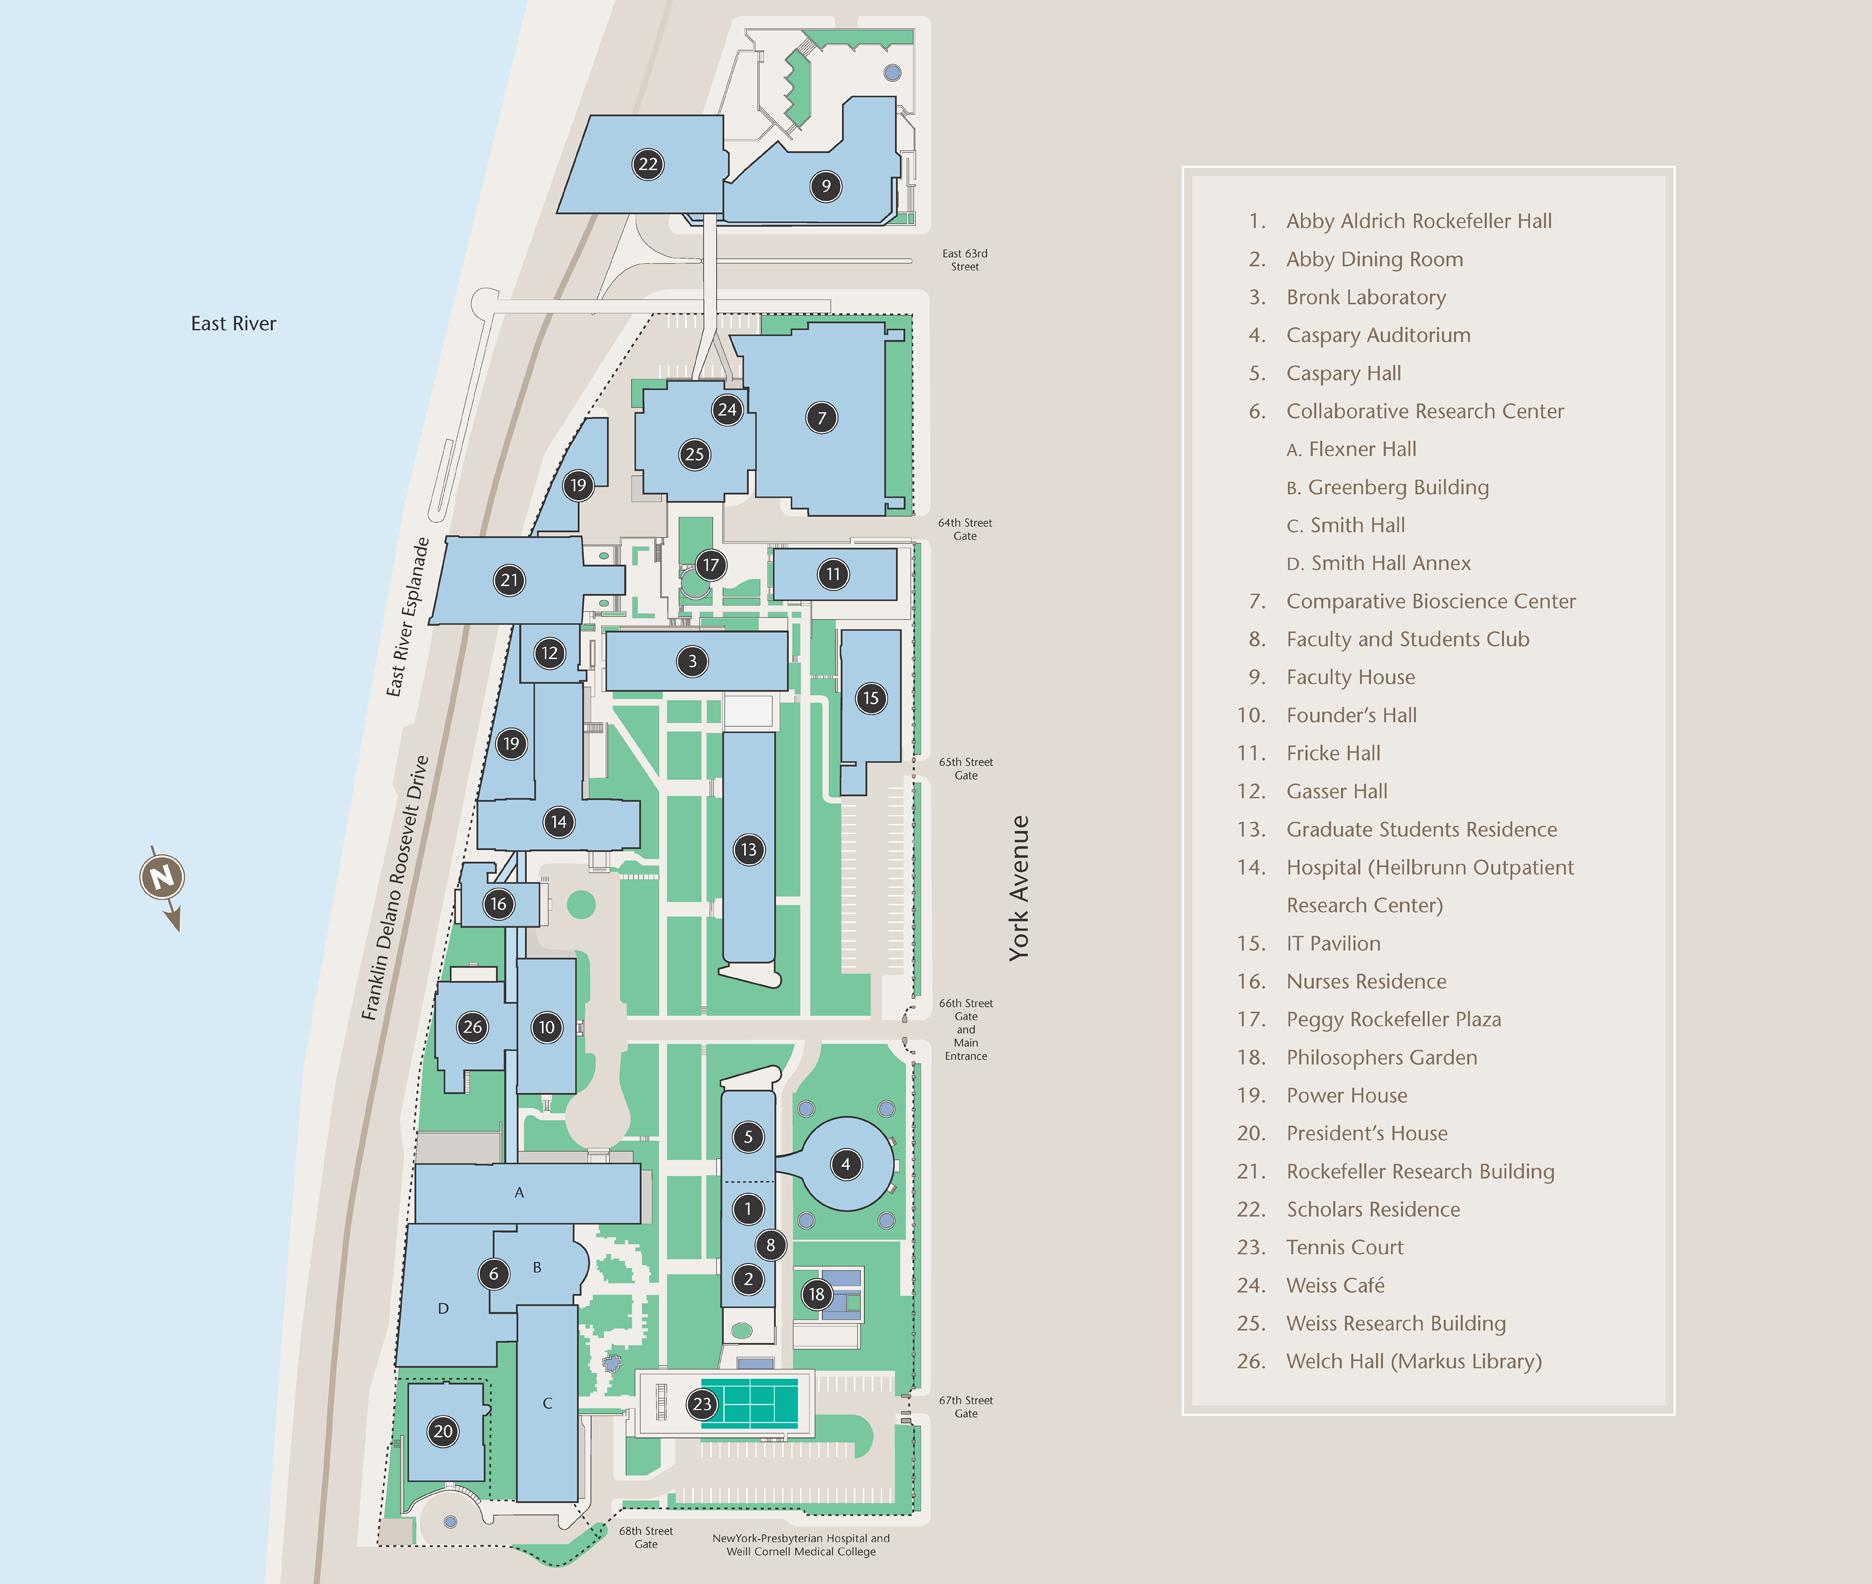 Rockefeller University Campus Map.Rockefeller University Map Rockefeller Rockefeller University